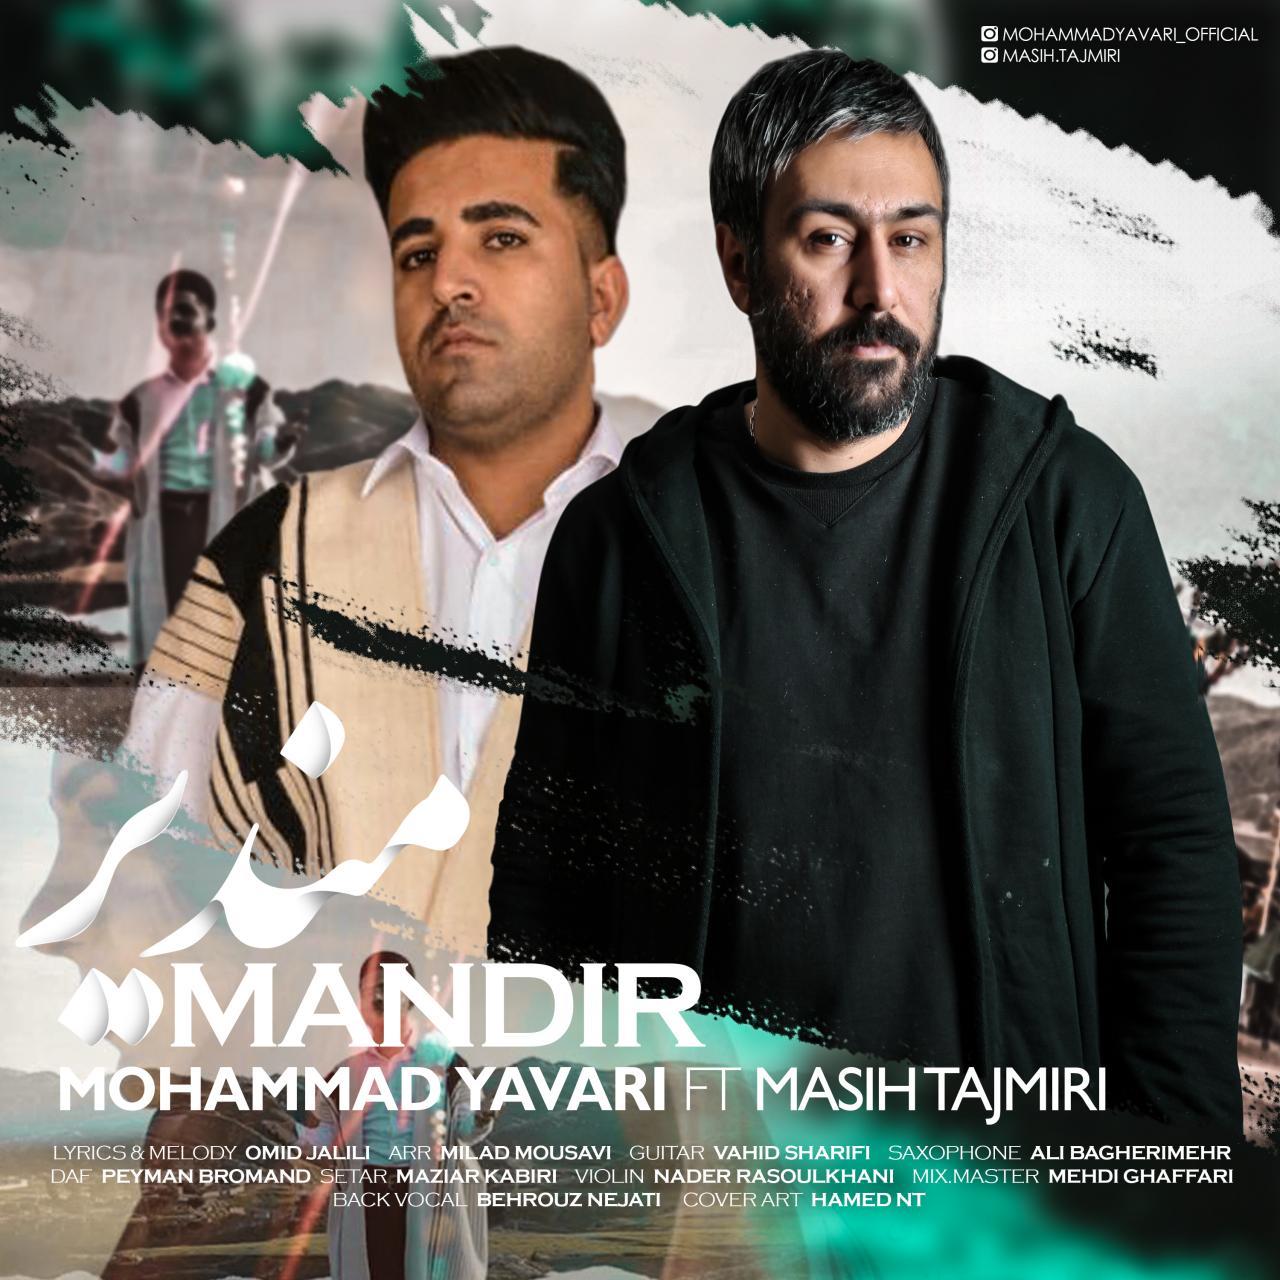 Mohammad Yavari – Mandir (Ft Masih Tajmiri)